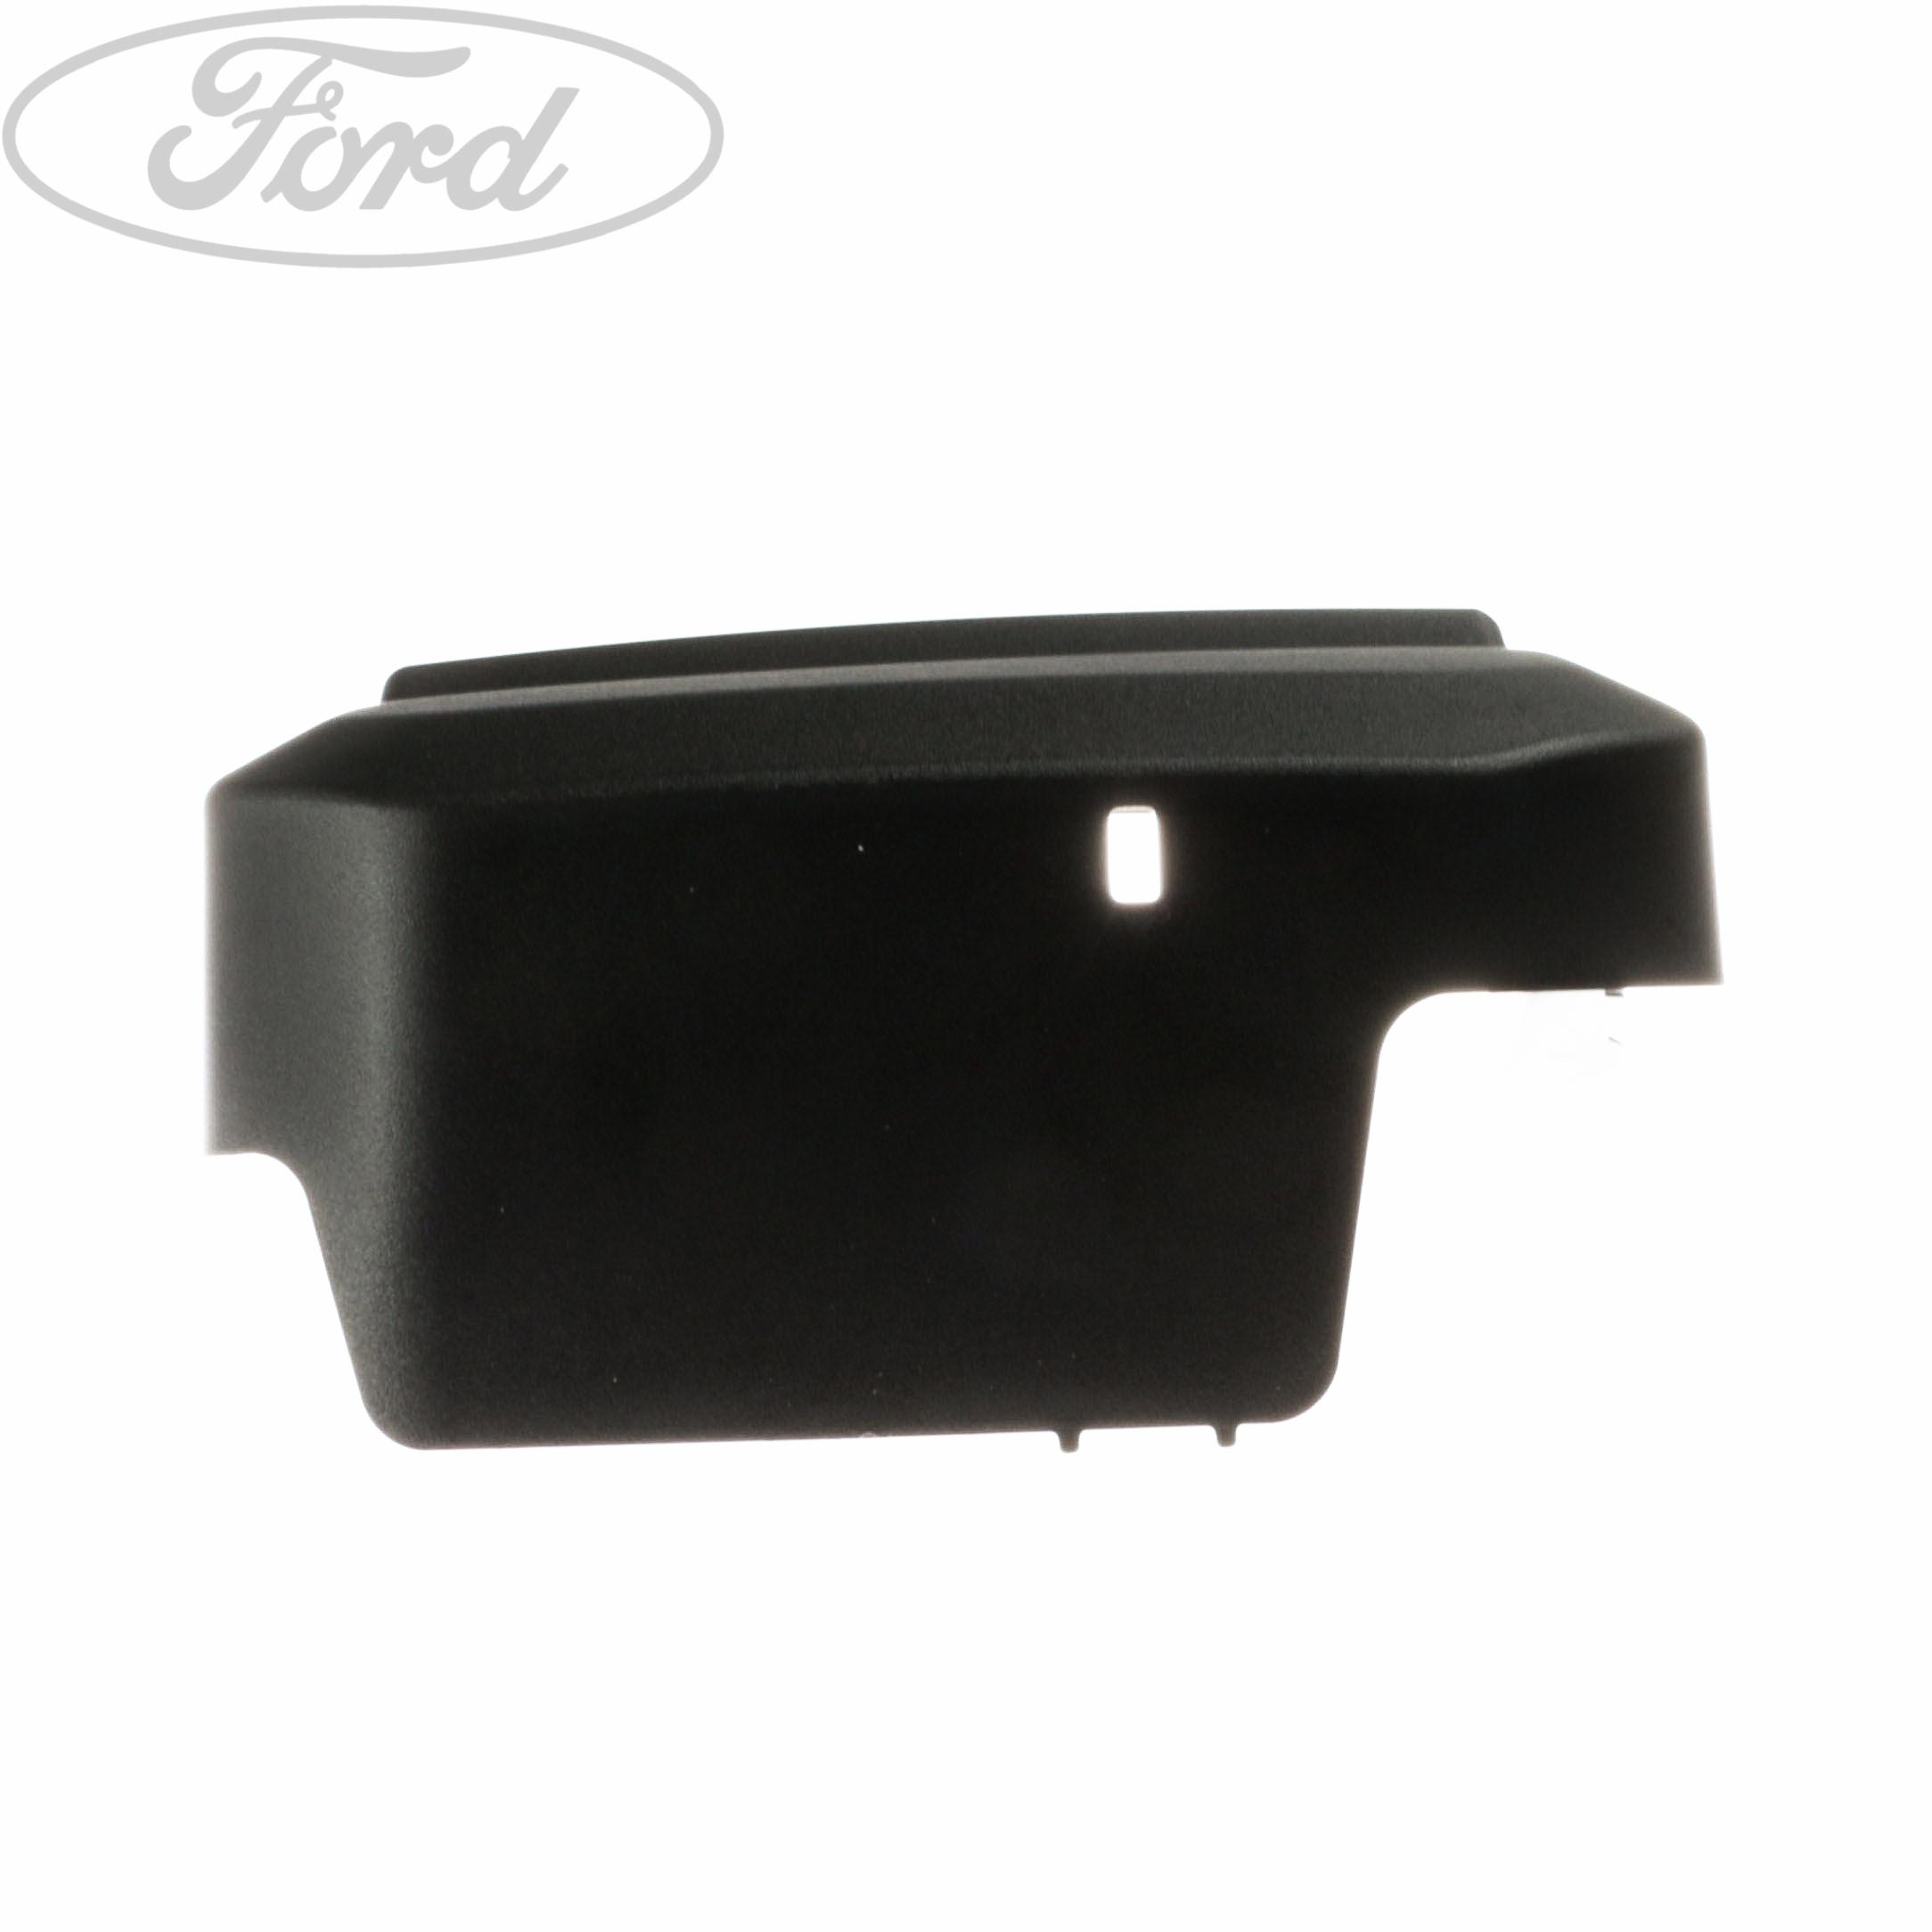 genuine ford focus mk ii focus c max mpv battery cover 1424281 ebay. Black Bedroom Furniture Sets. Home Design Ideas